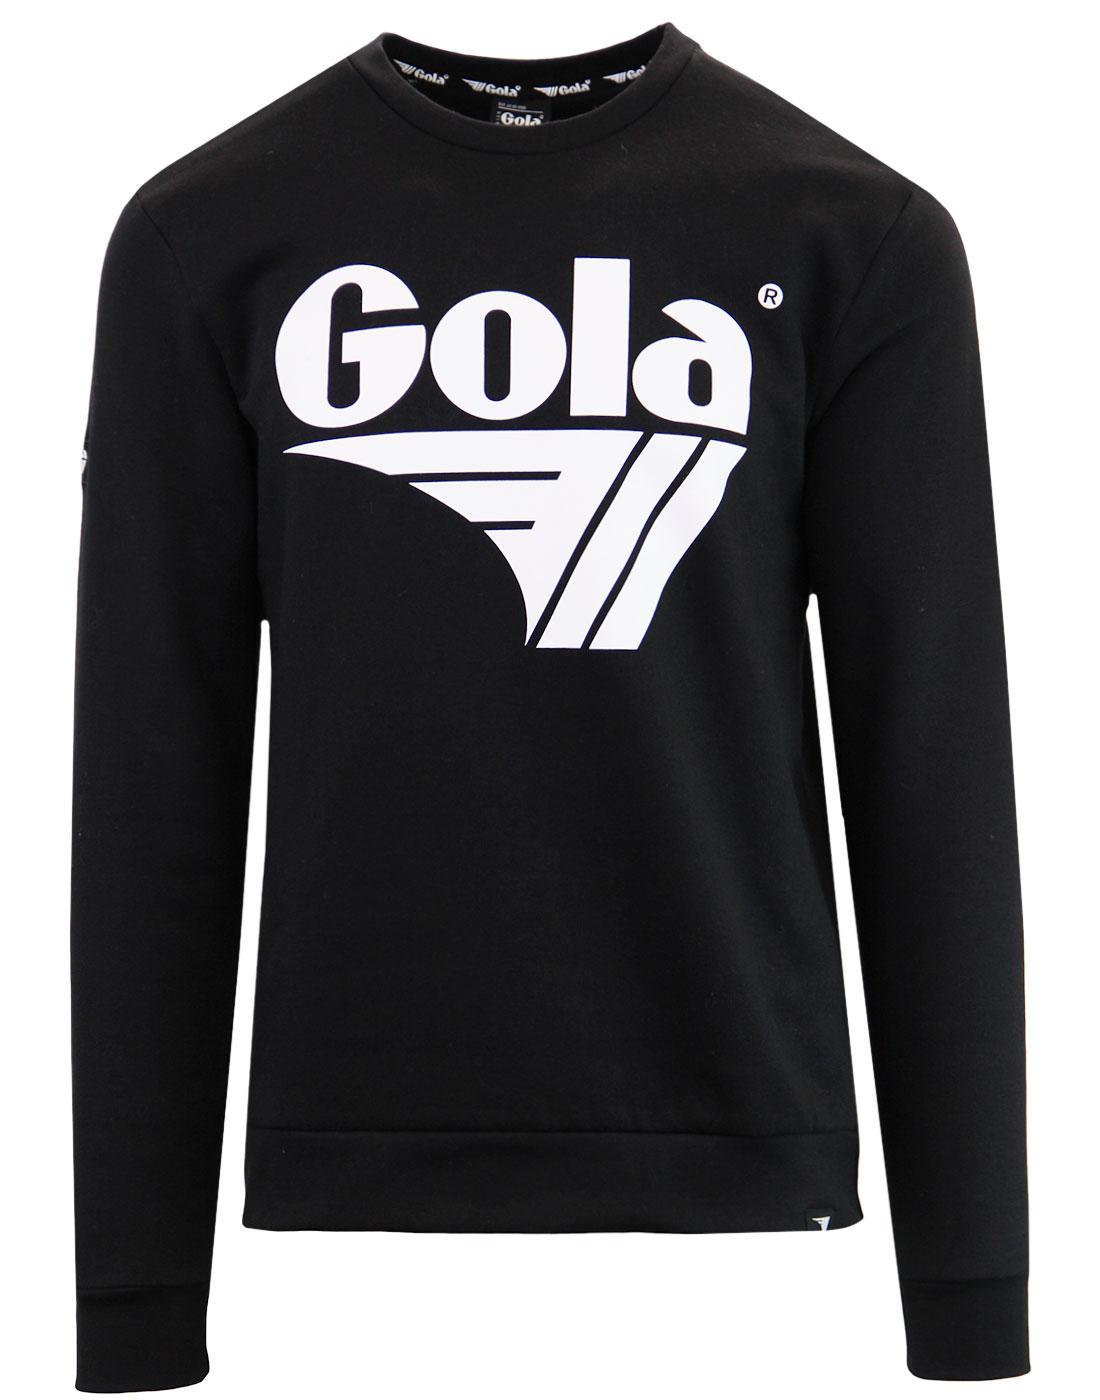 Bell GOLA CLASSICS Retro 80's Logo Sweatshirt